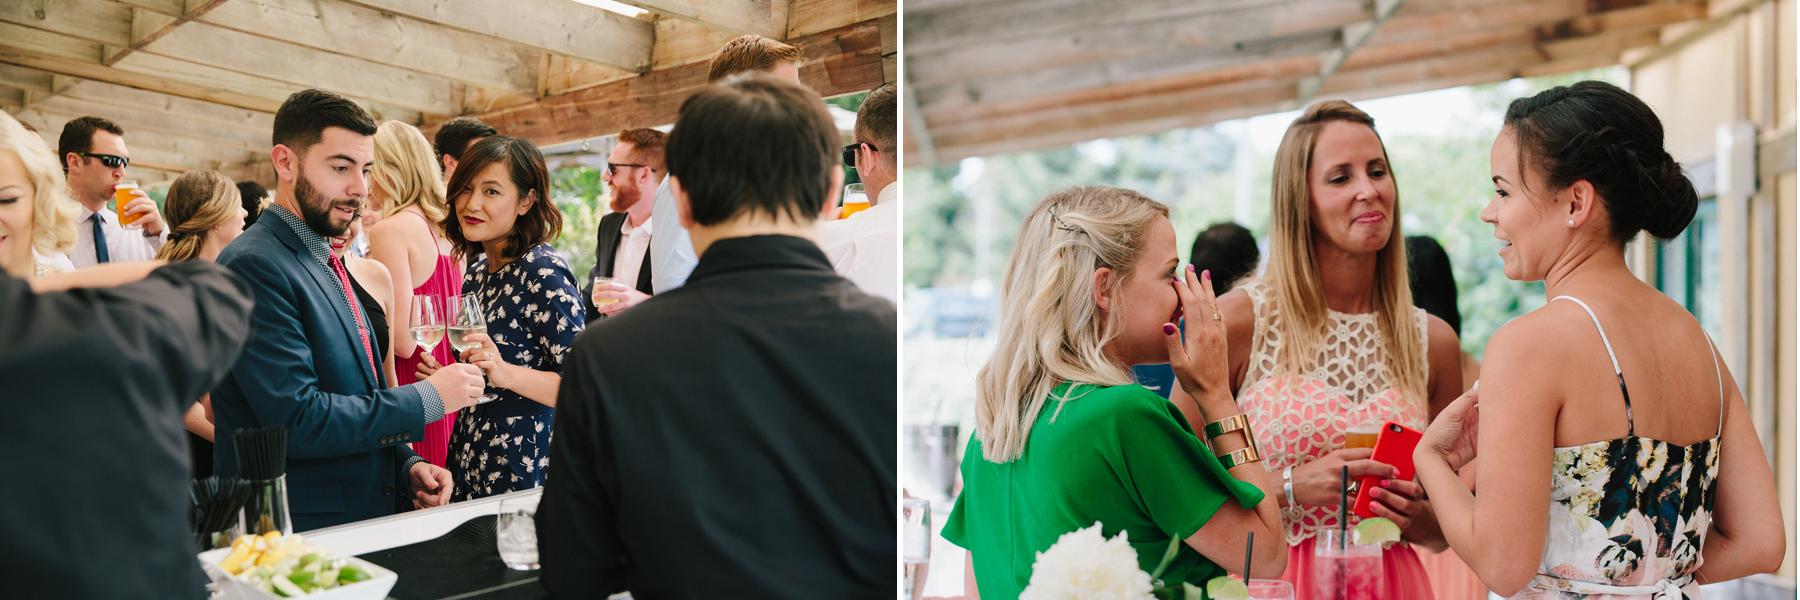 UBC-Botanical-Garden-Wedding-AD-050.jpg